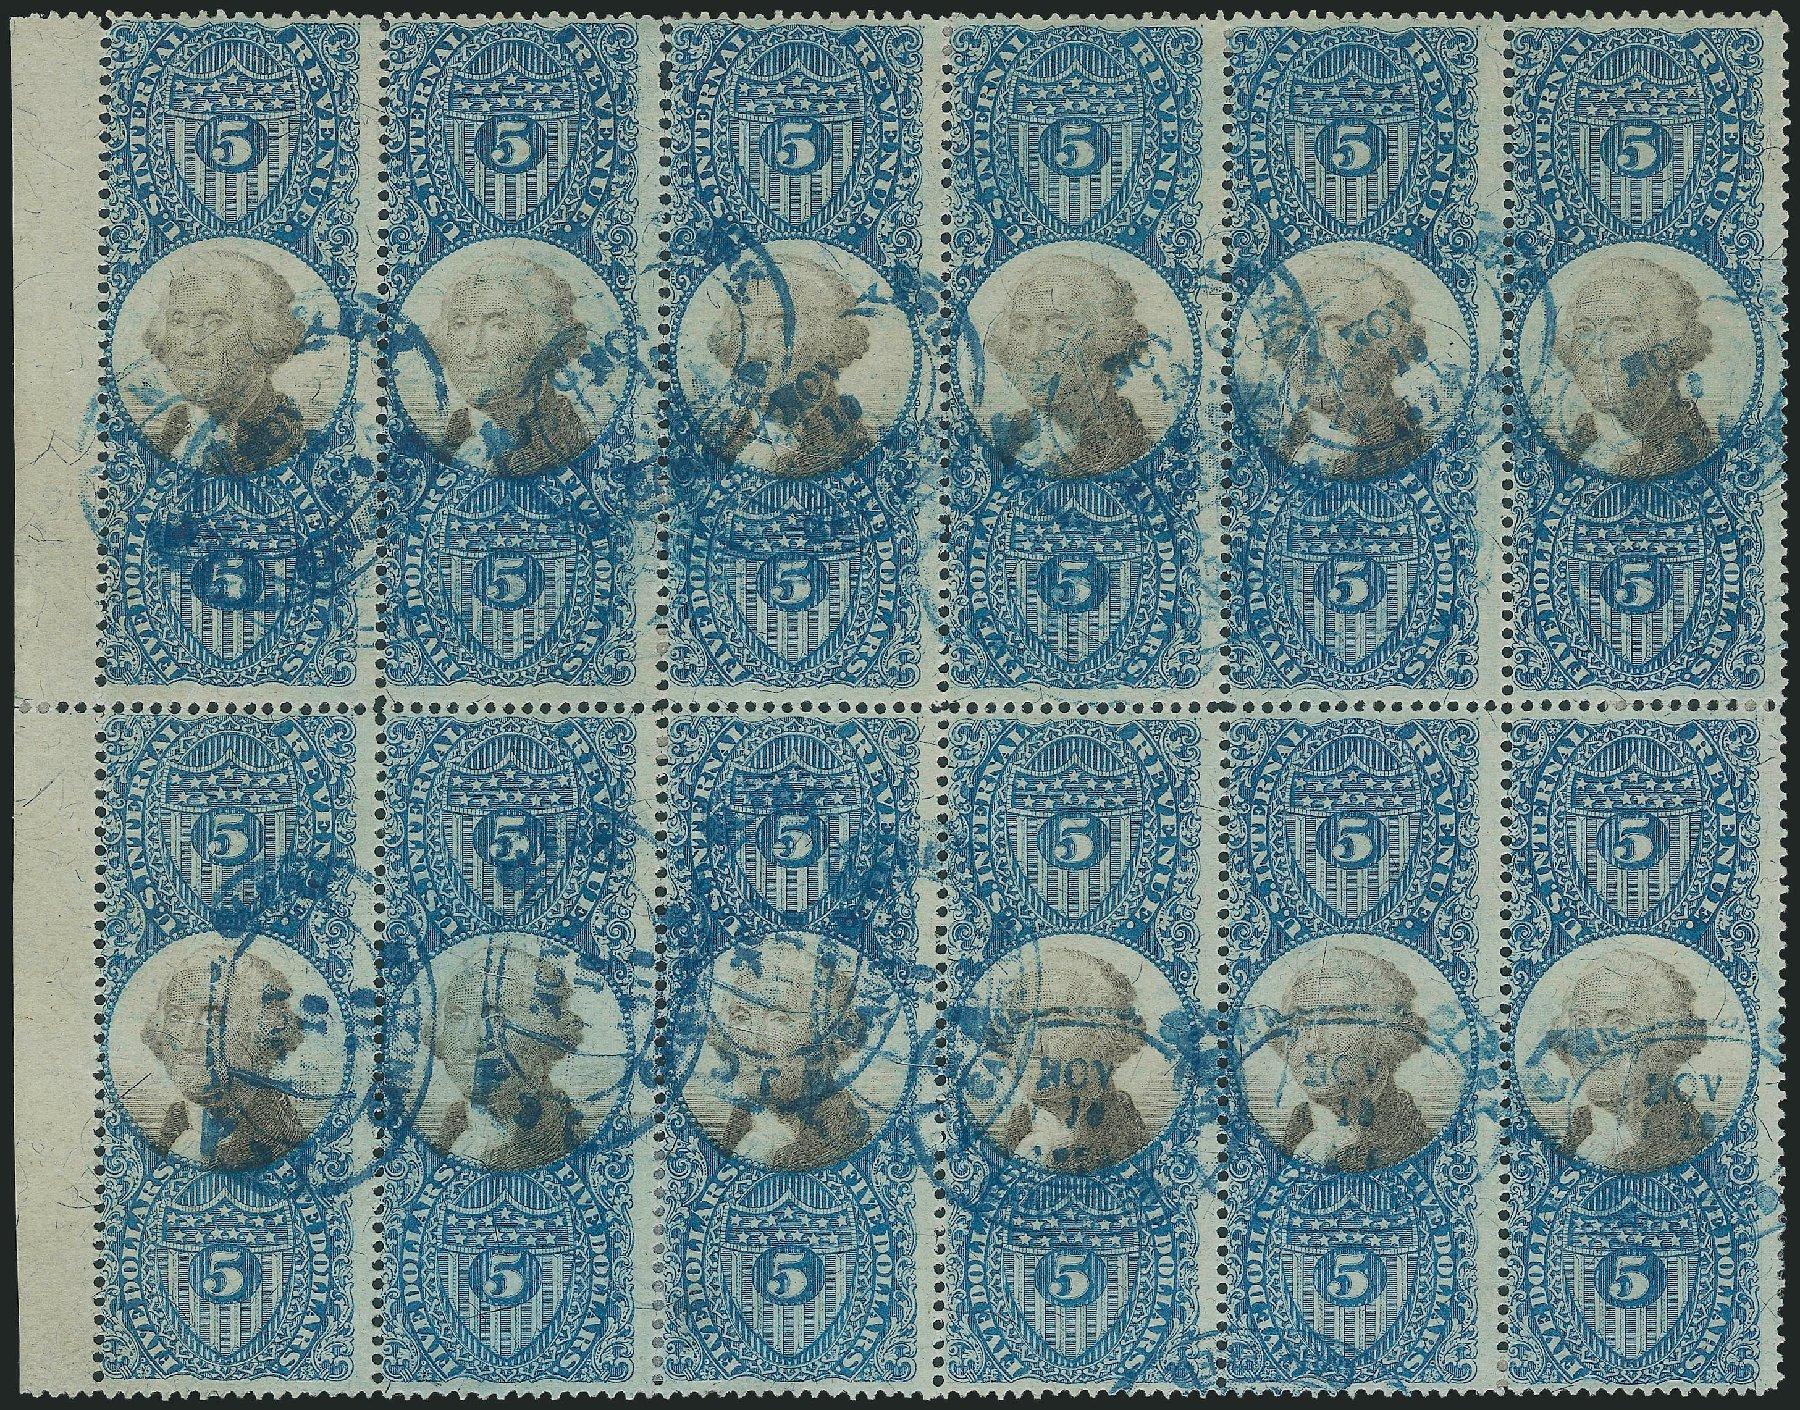 US Stamp Value Scott Catalog R127: US$5.00 1871 Revenue Documentary . Robert Siegel Auction Galleries, Dec 2014, Sale 1089, Lot 503